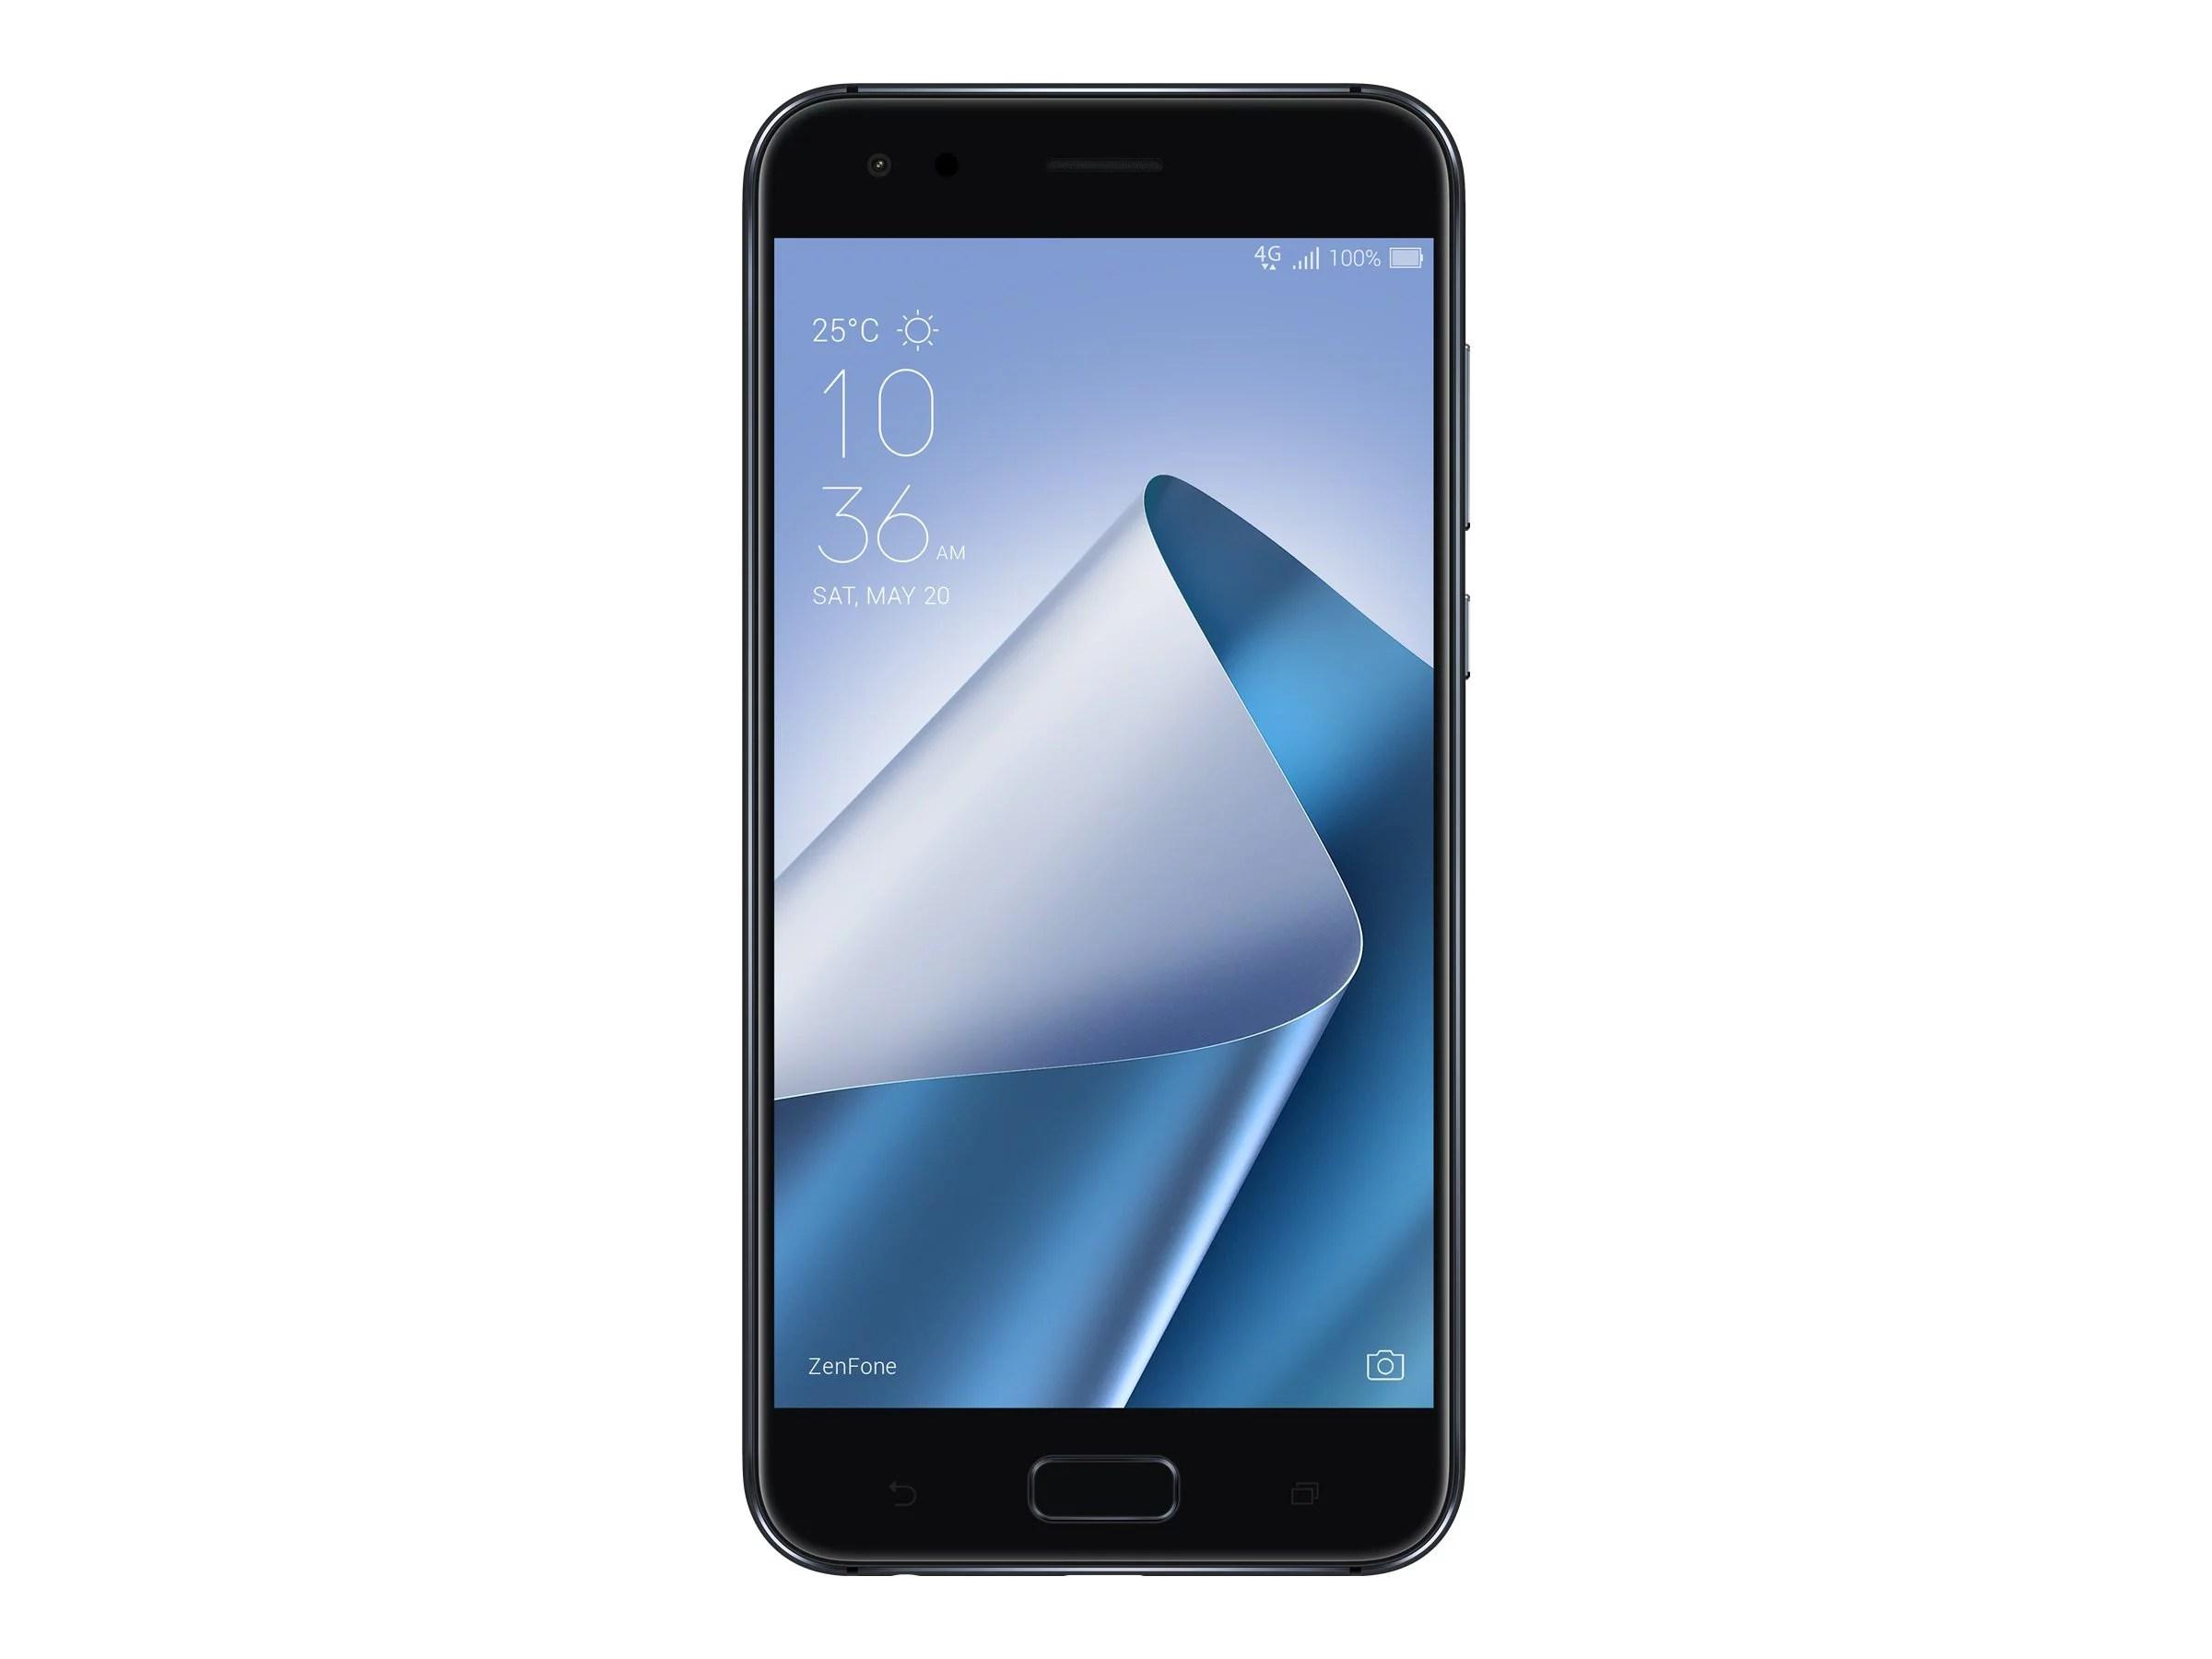 ASUS ZenFone 4 (ZE554KL) - Smartphone - dual-SIM - 4G LTE - 64 GB - microSD slot - 5.5